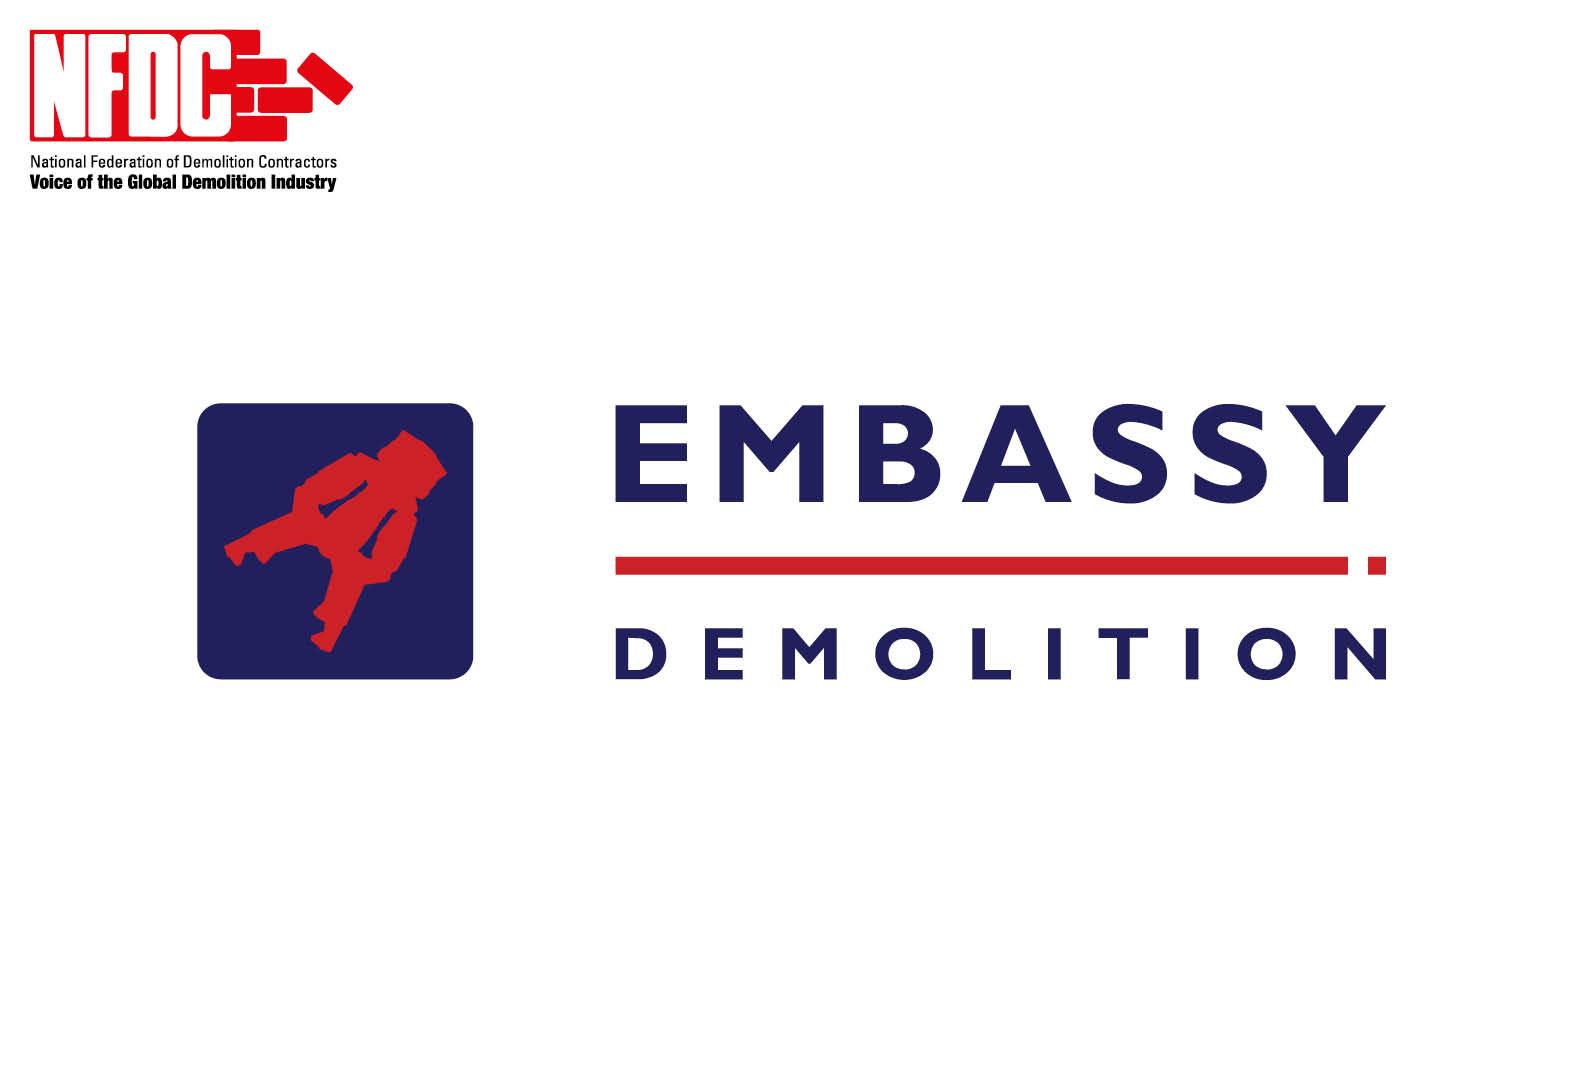 Embassy Demolition